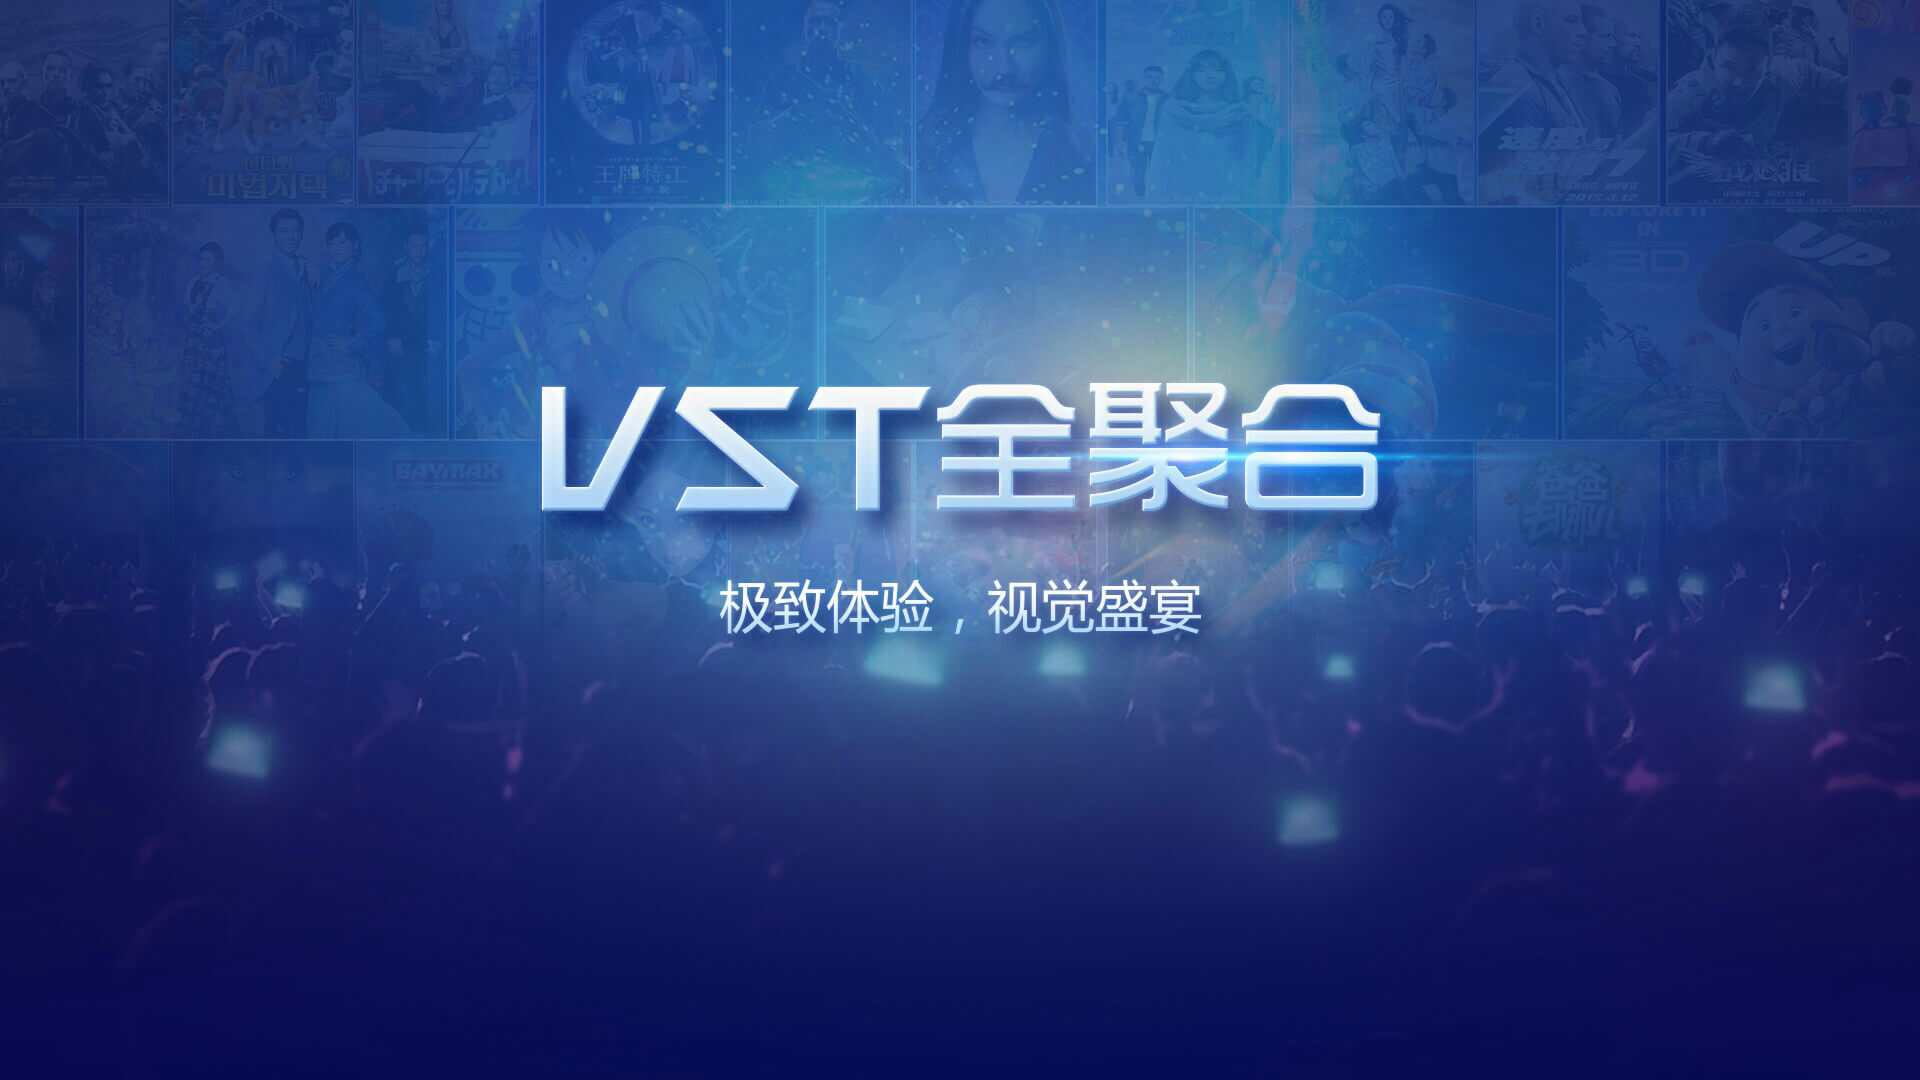 """VST全聚合""的图片搜索结果"